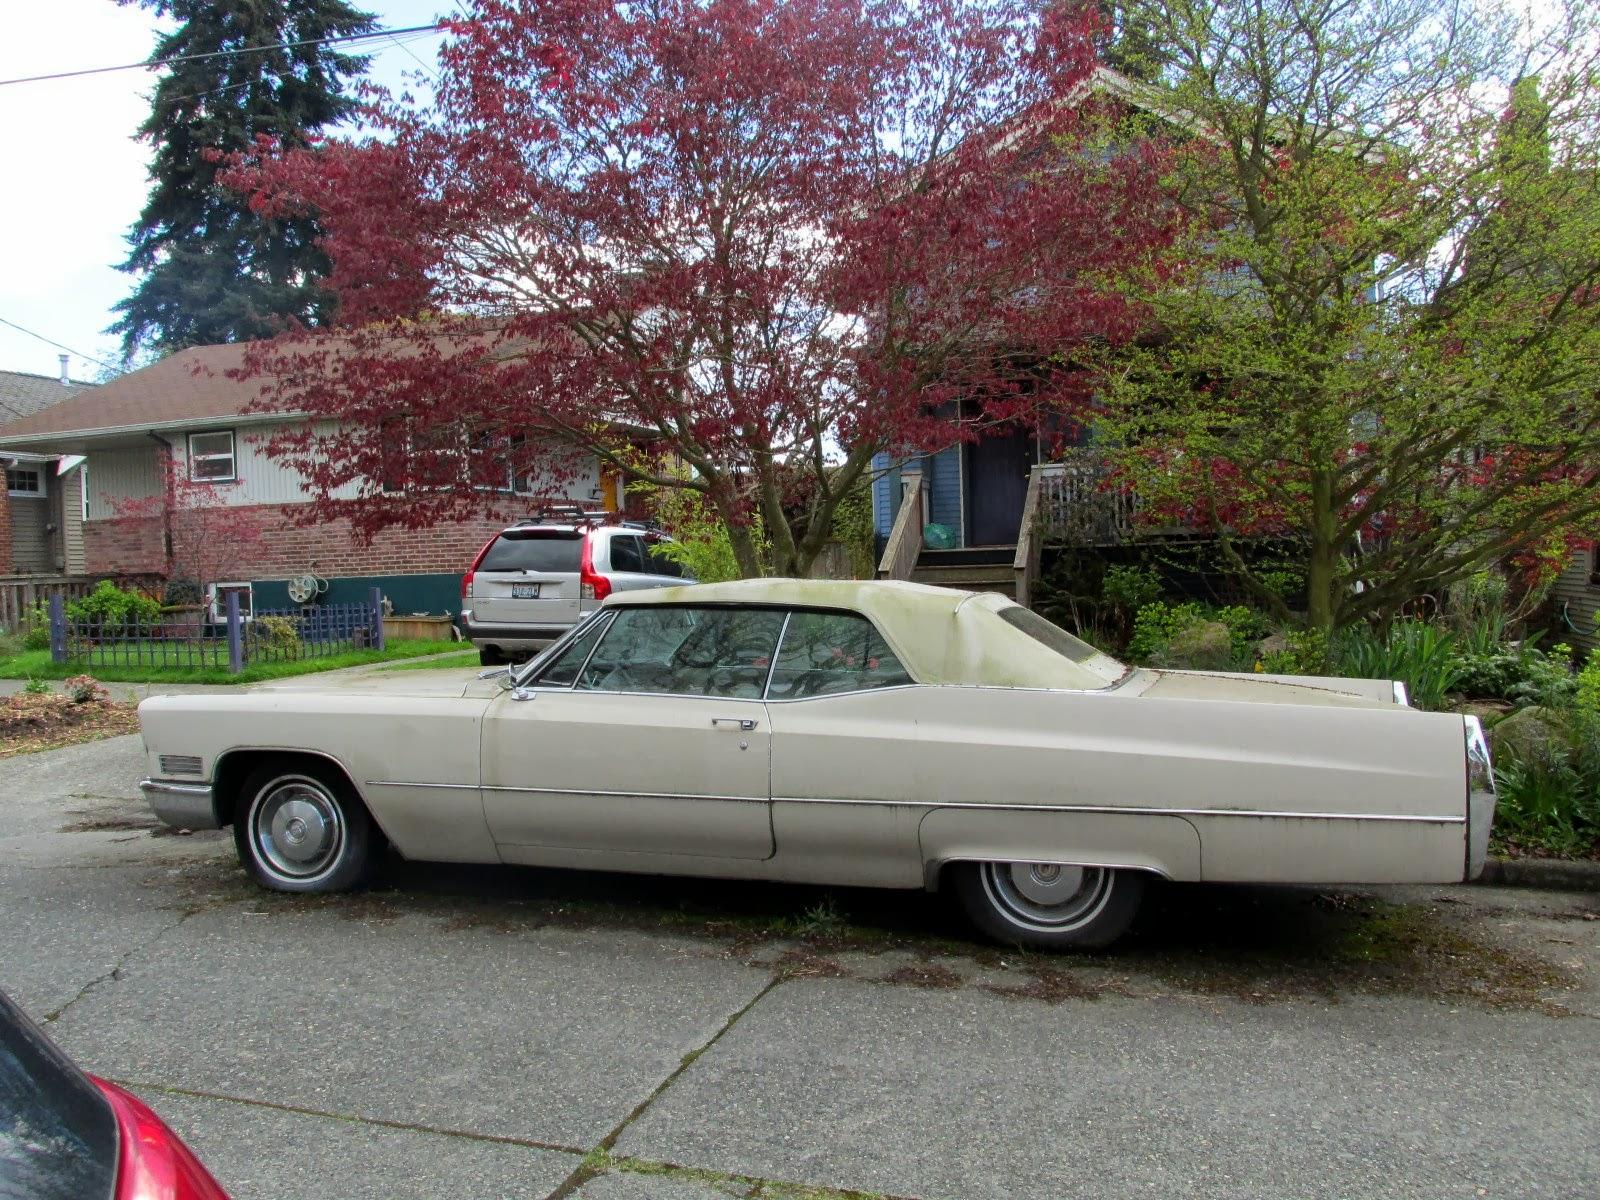 Seattle's Classics: 1967 Cadillac DeVille Convertible